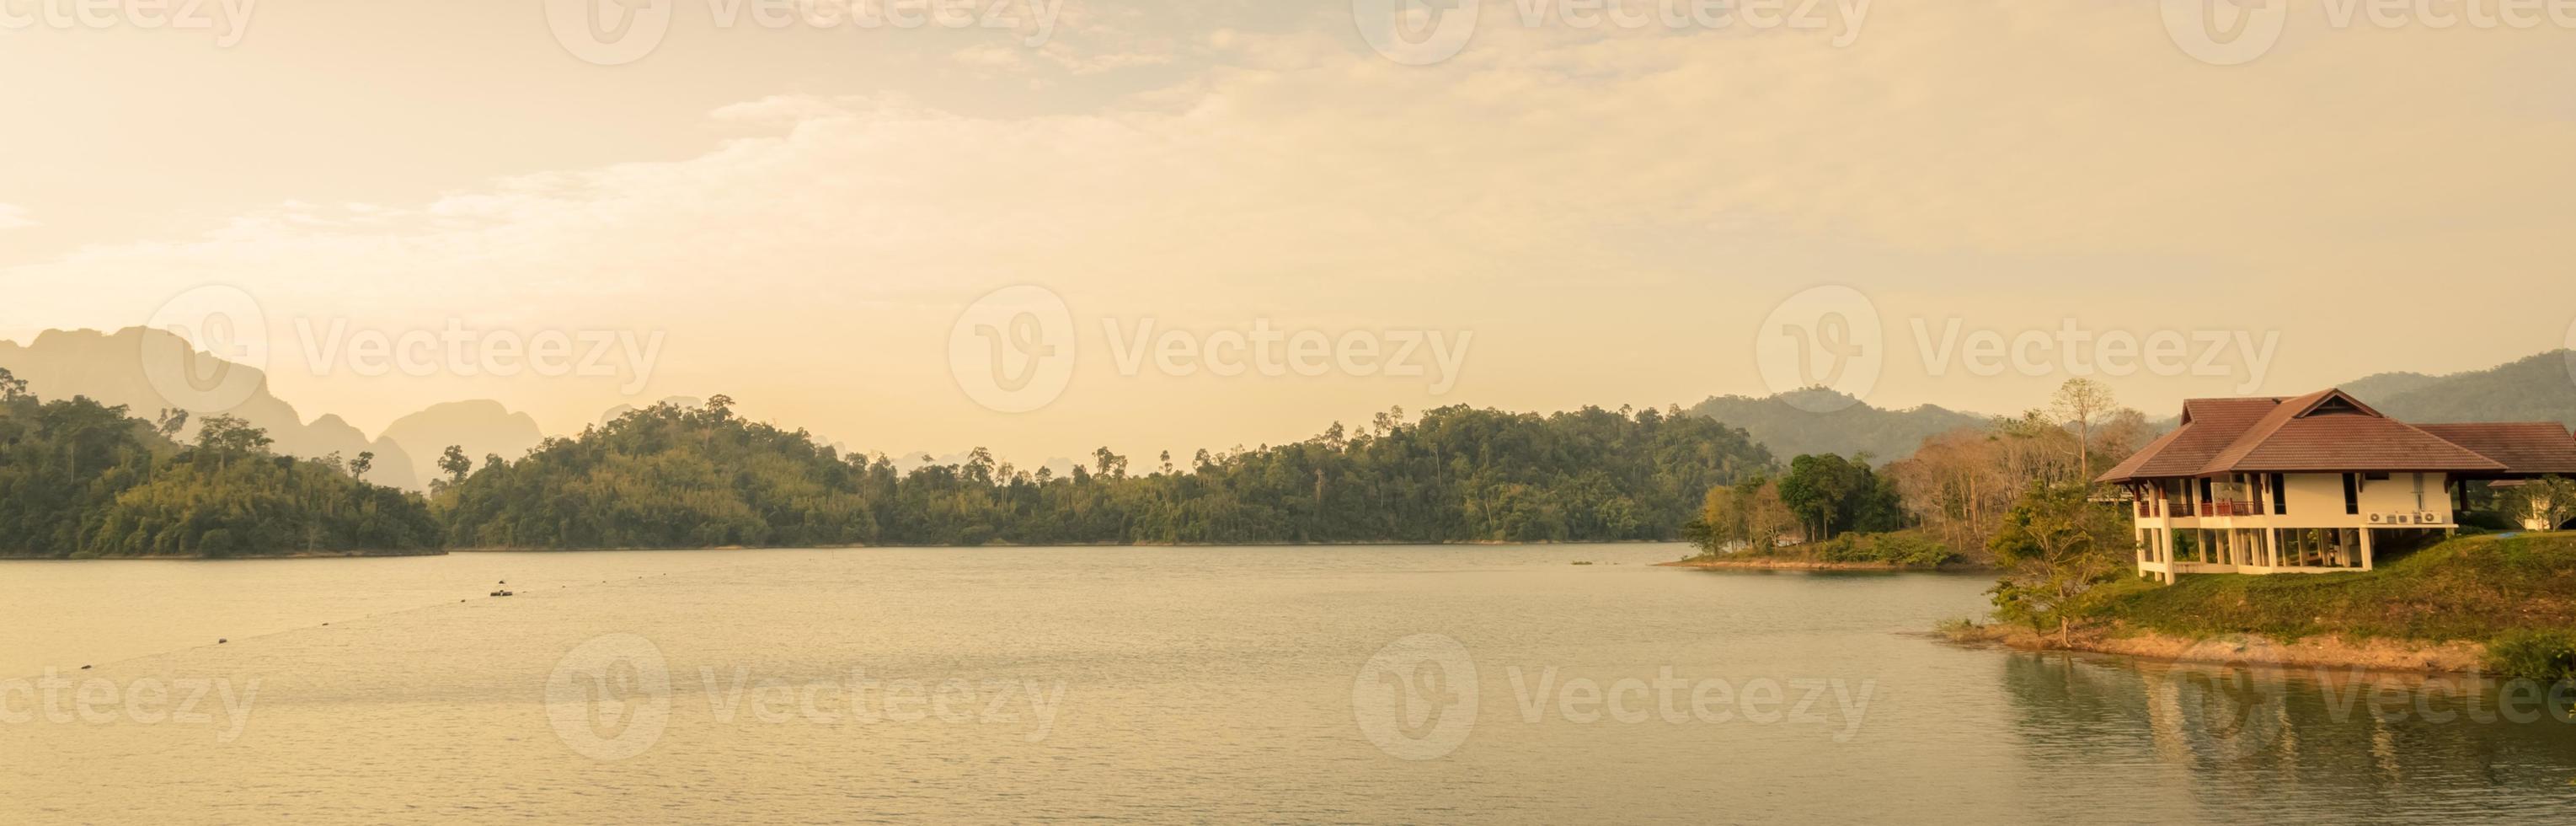 ratchaprapha dam i surat thani provinsen, Thailand foto